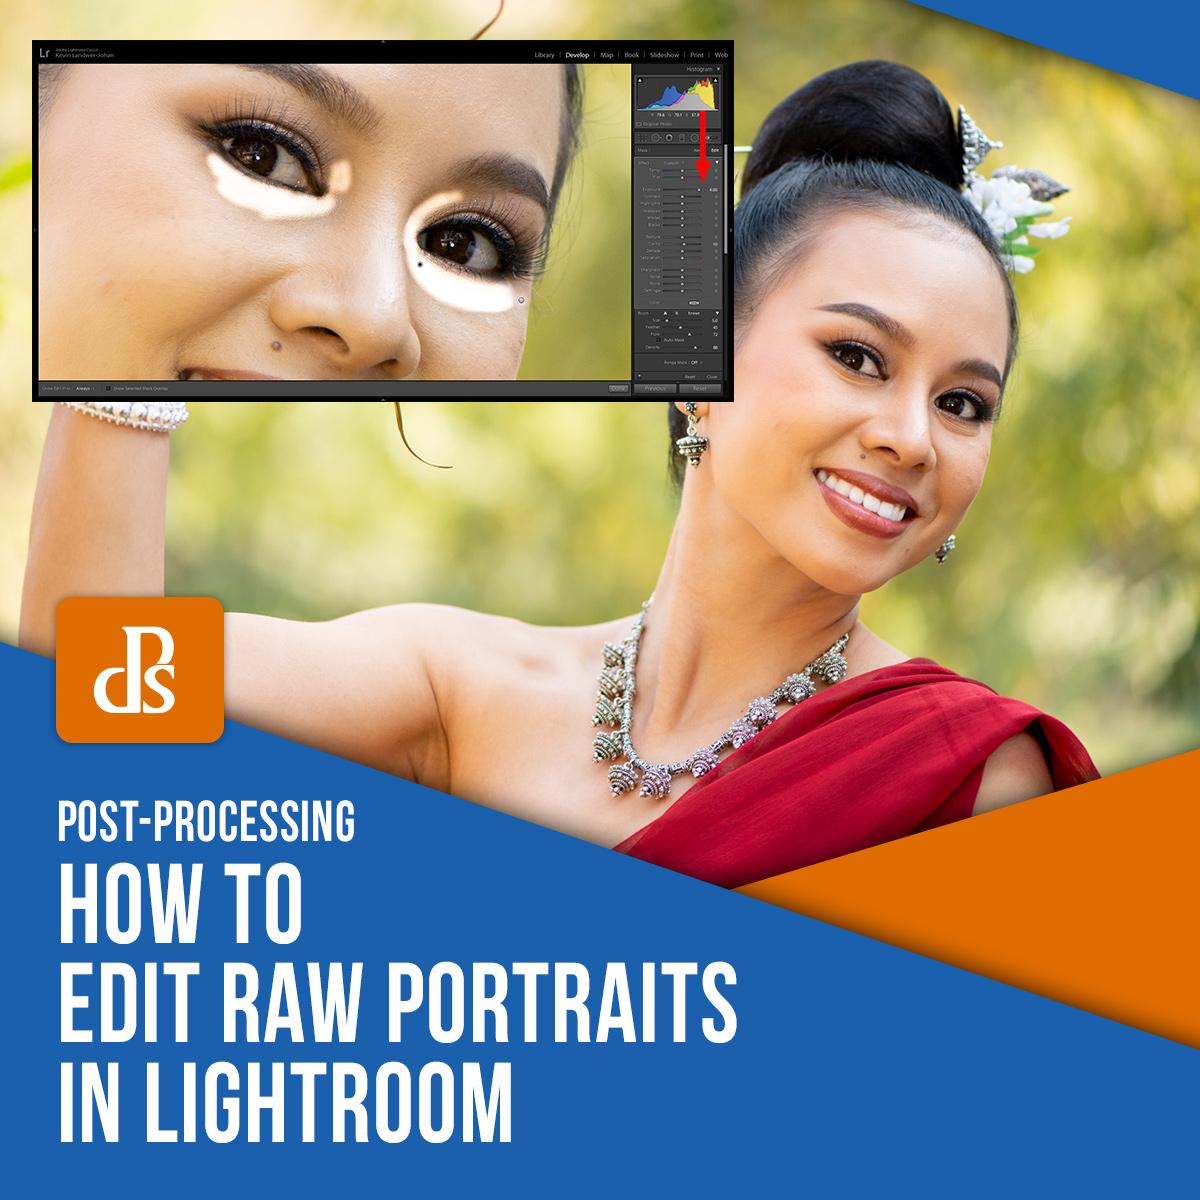 dps-edit-raw-portraits-in-lightroom